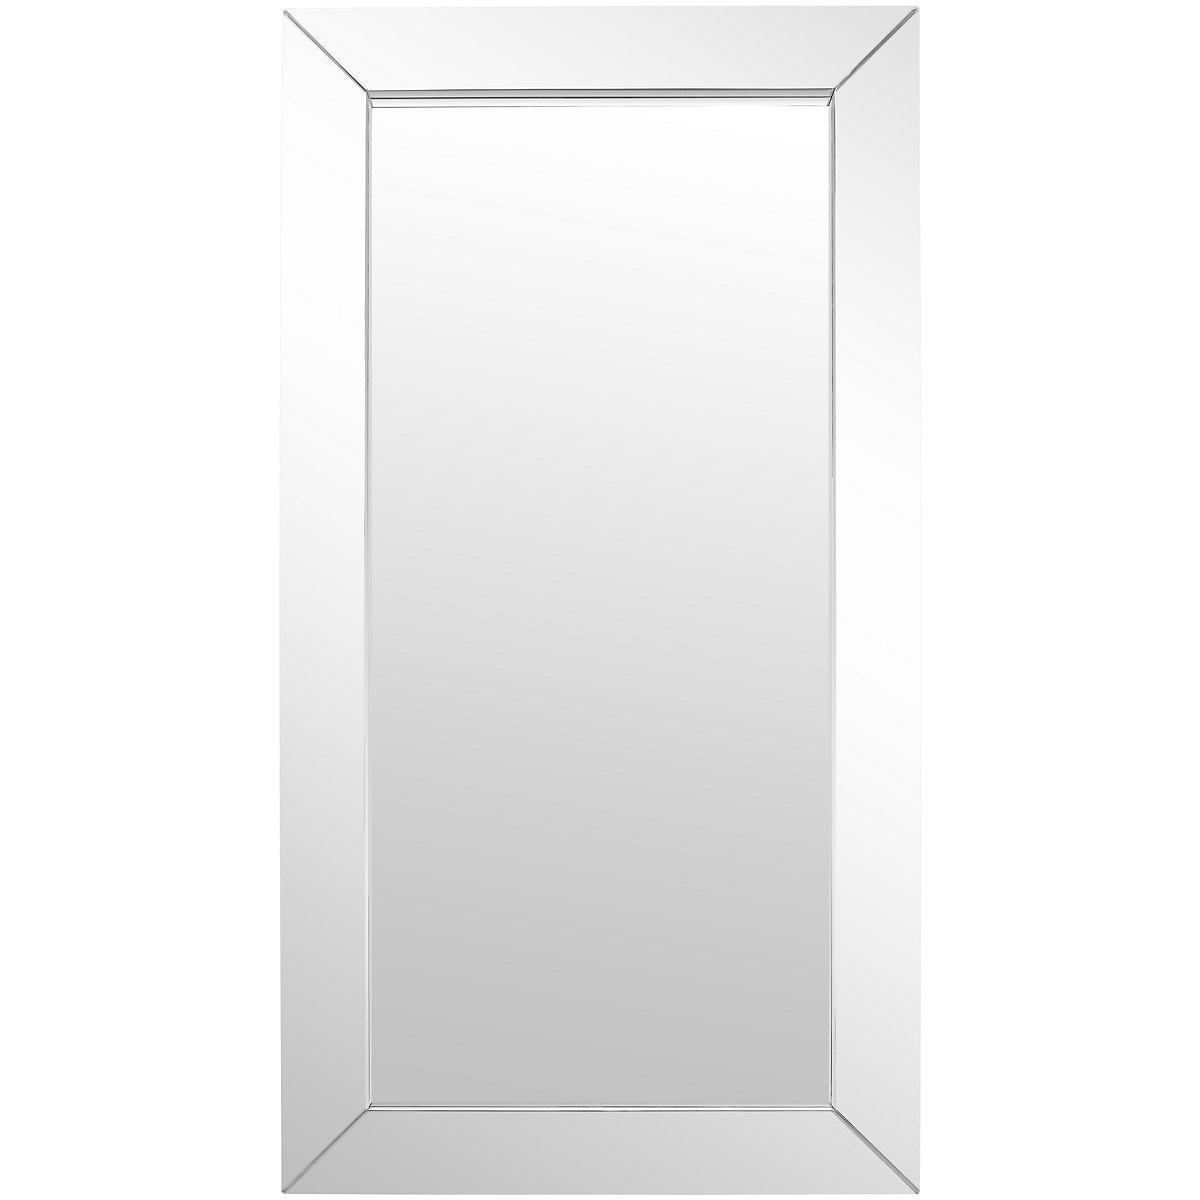 Aislin Mirror